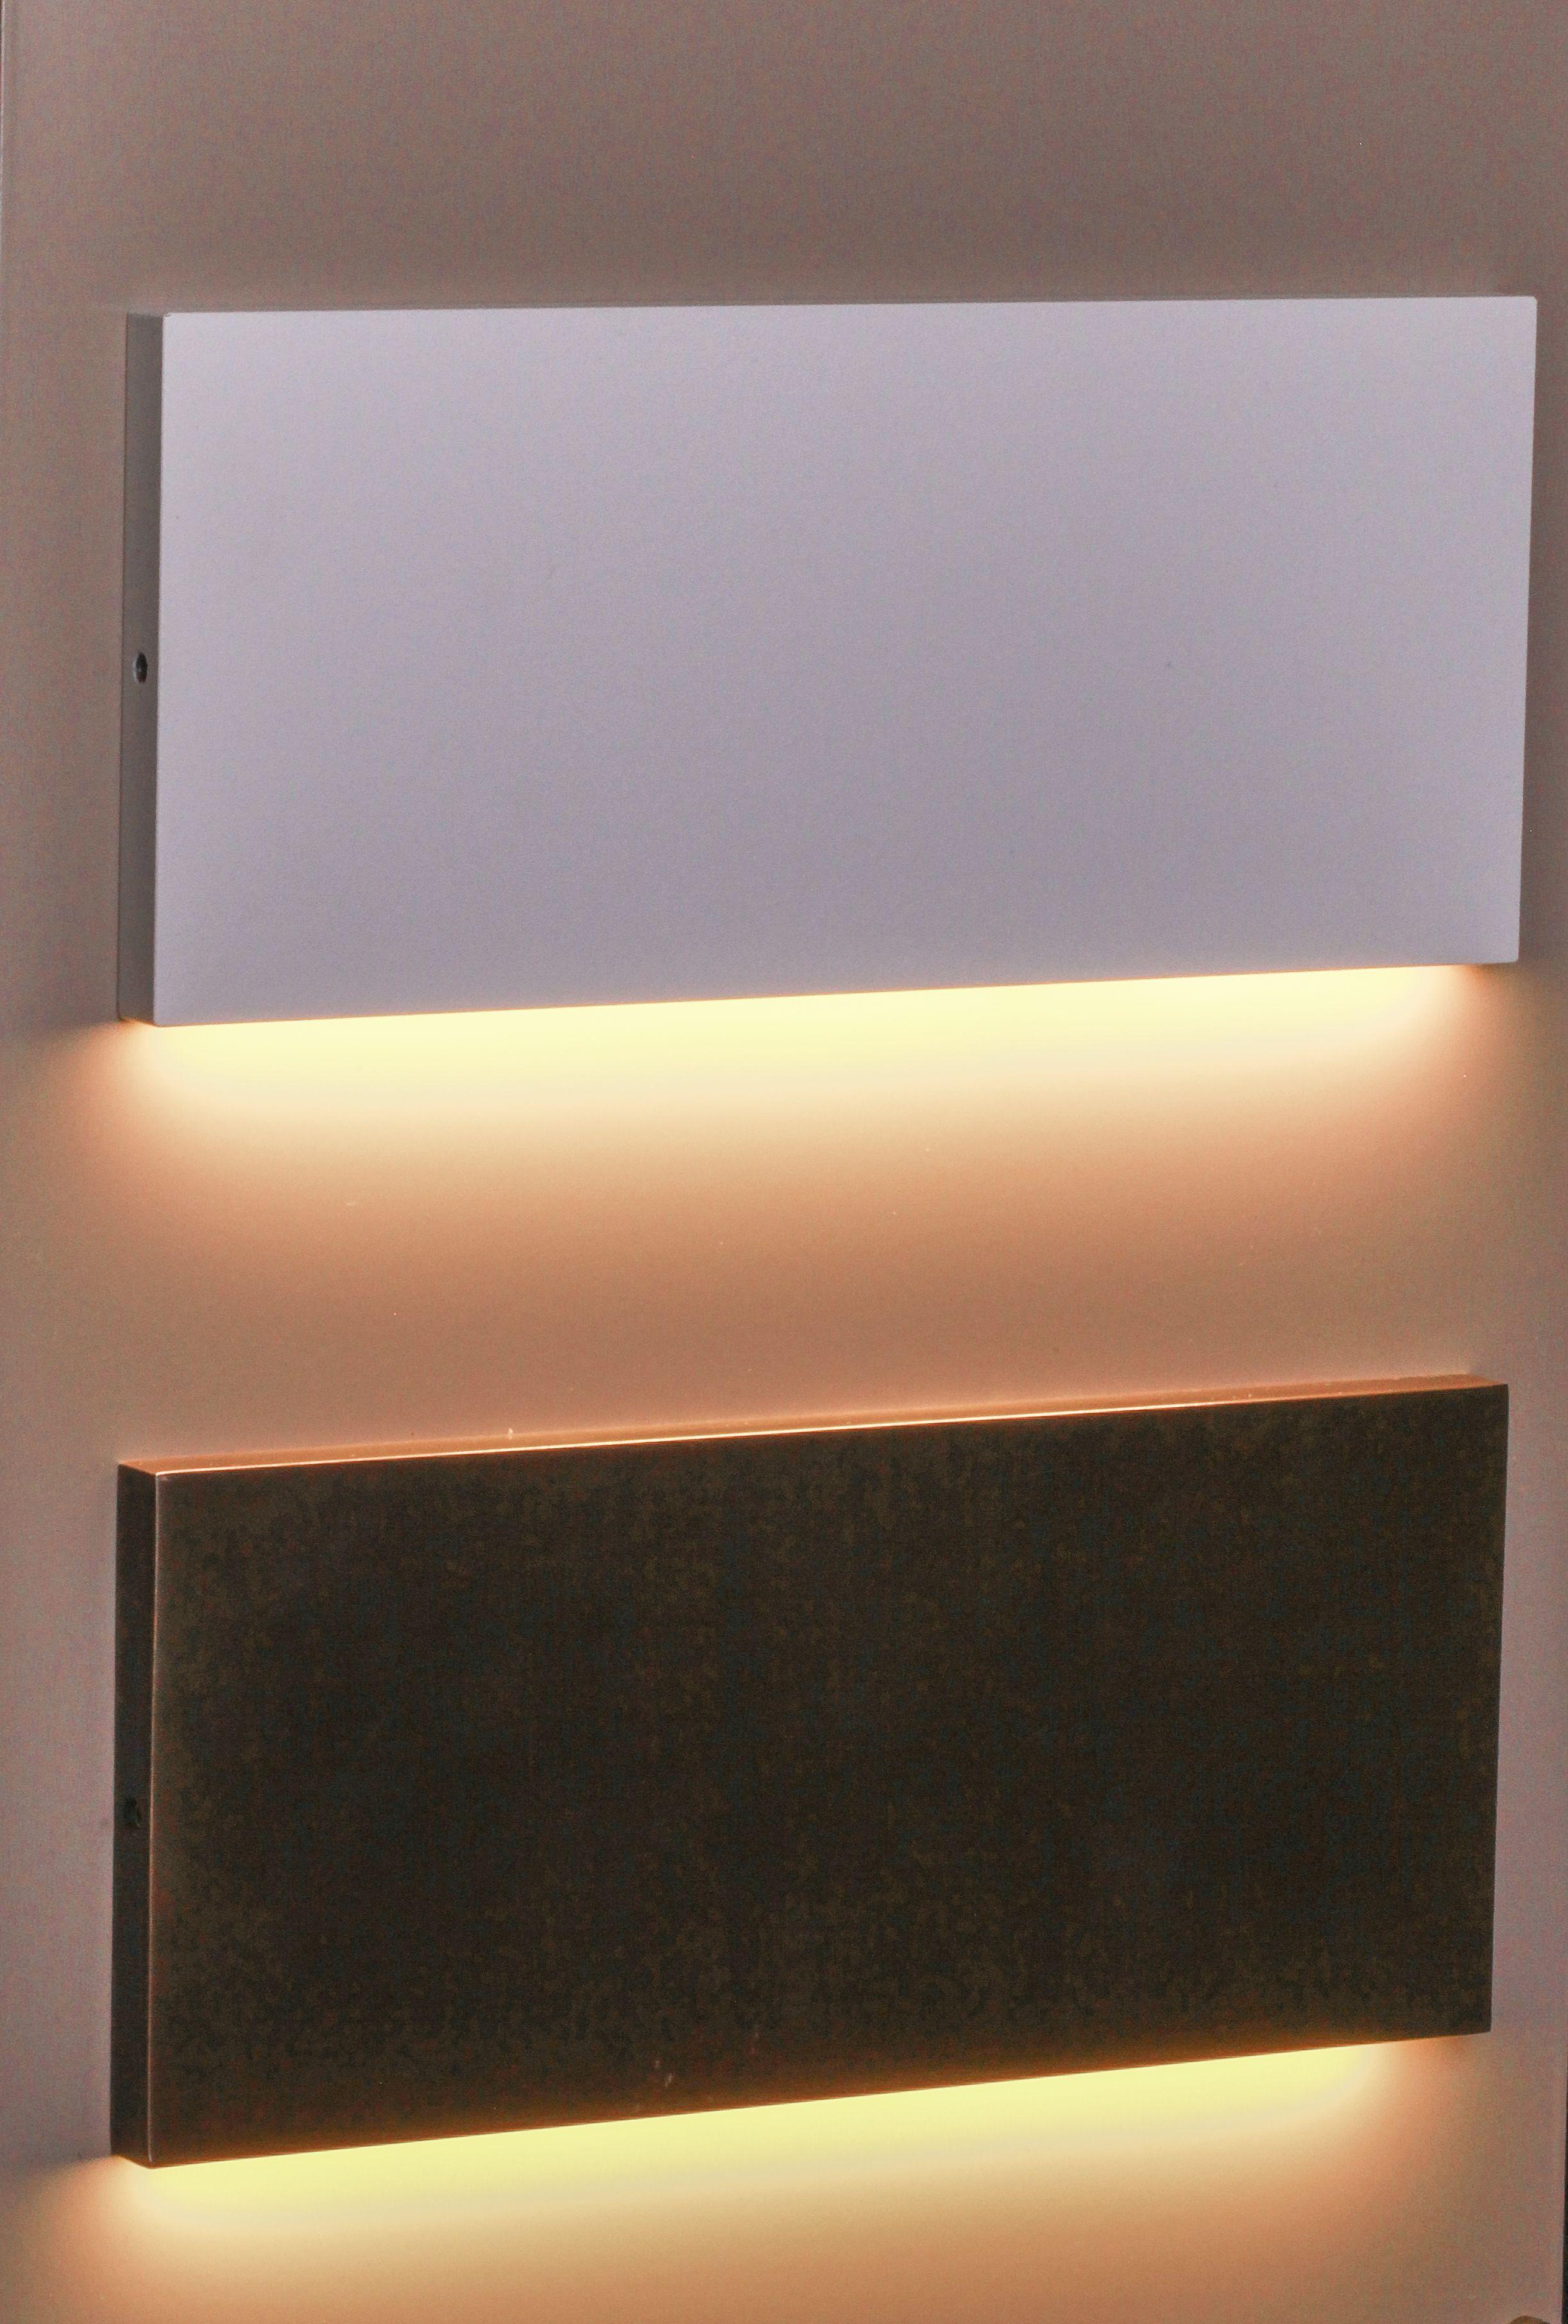 Nocturnal Lighting's 5 watt DUNNART WIDE low profile